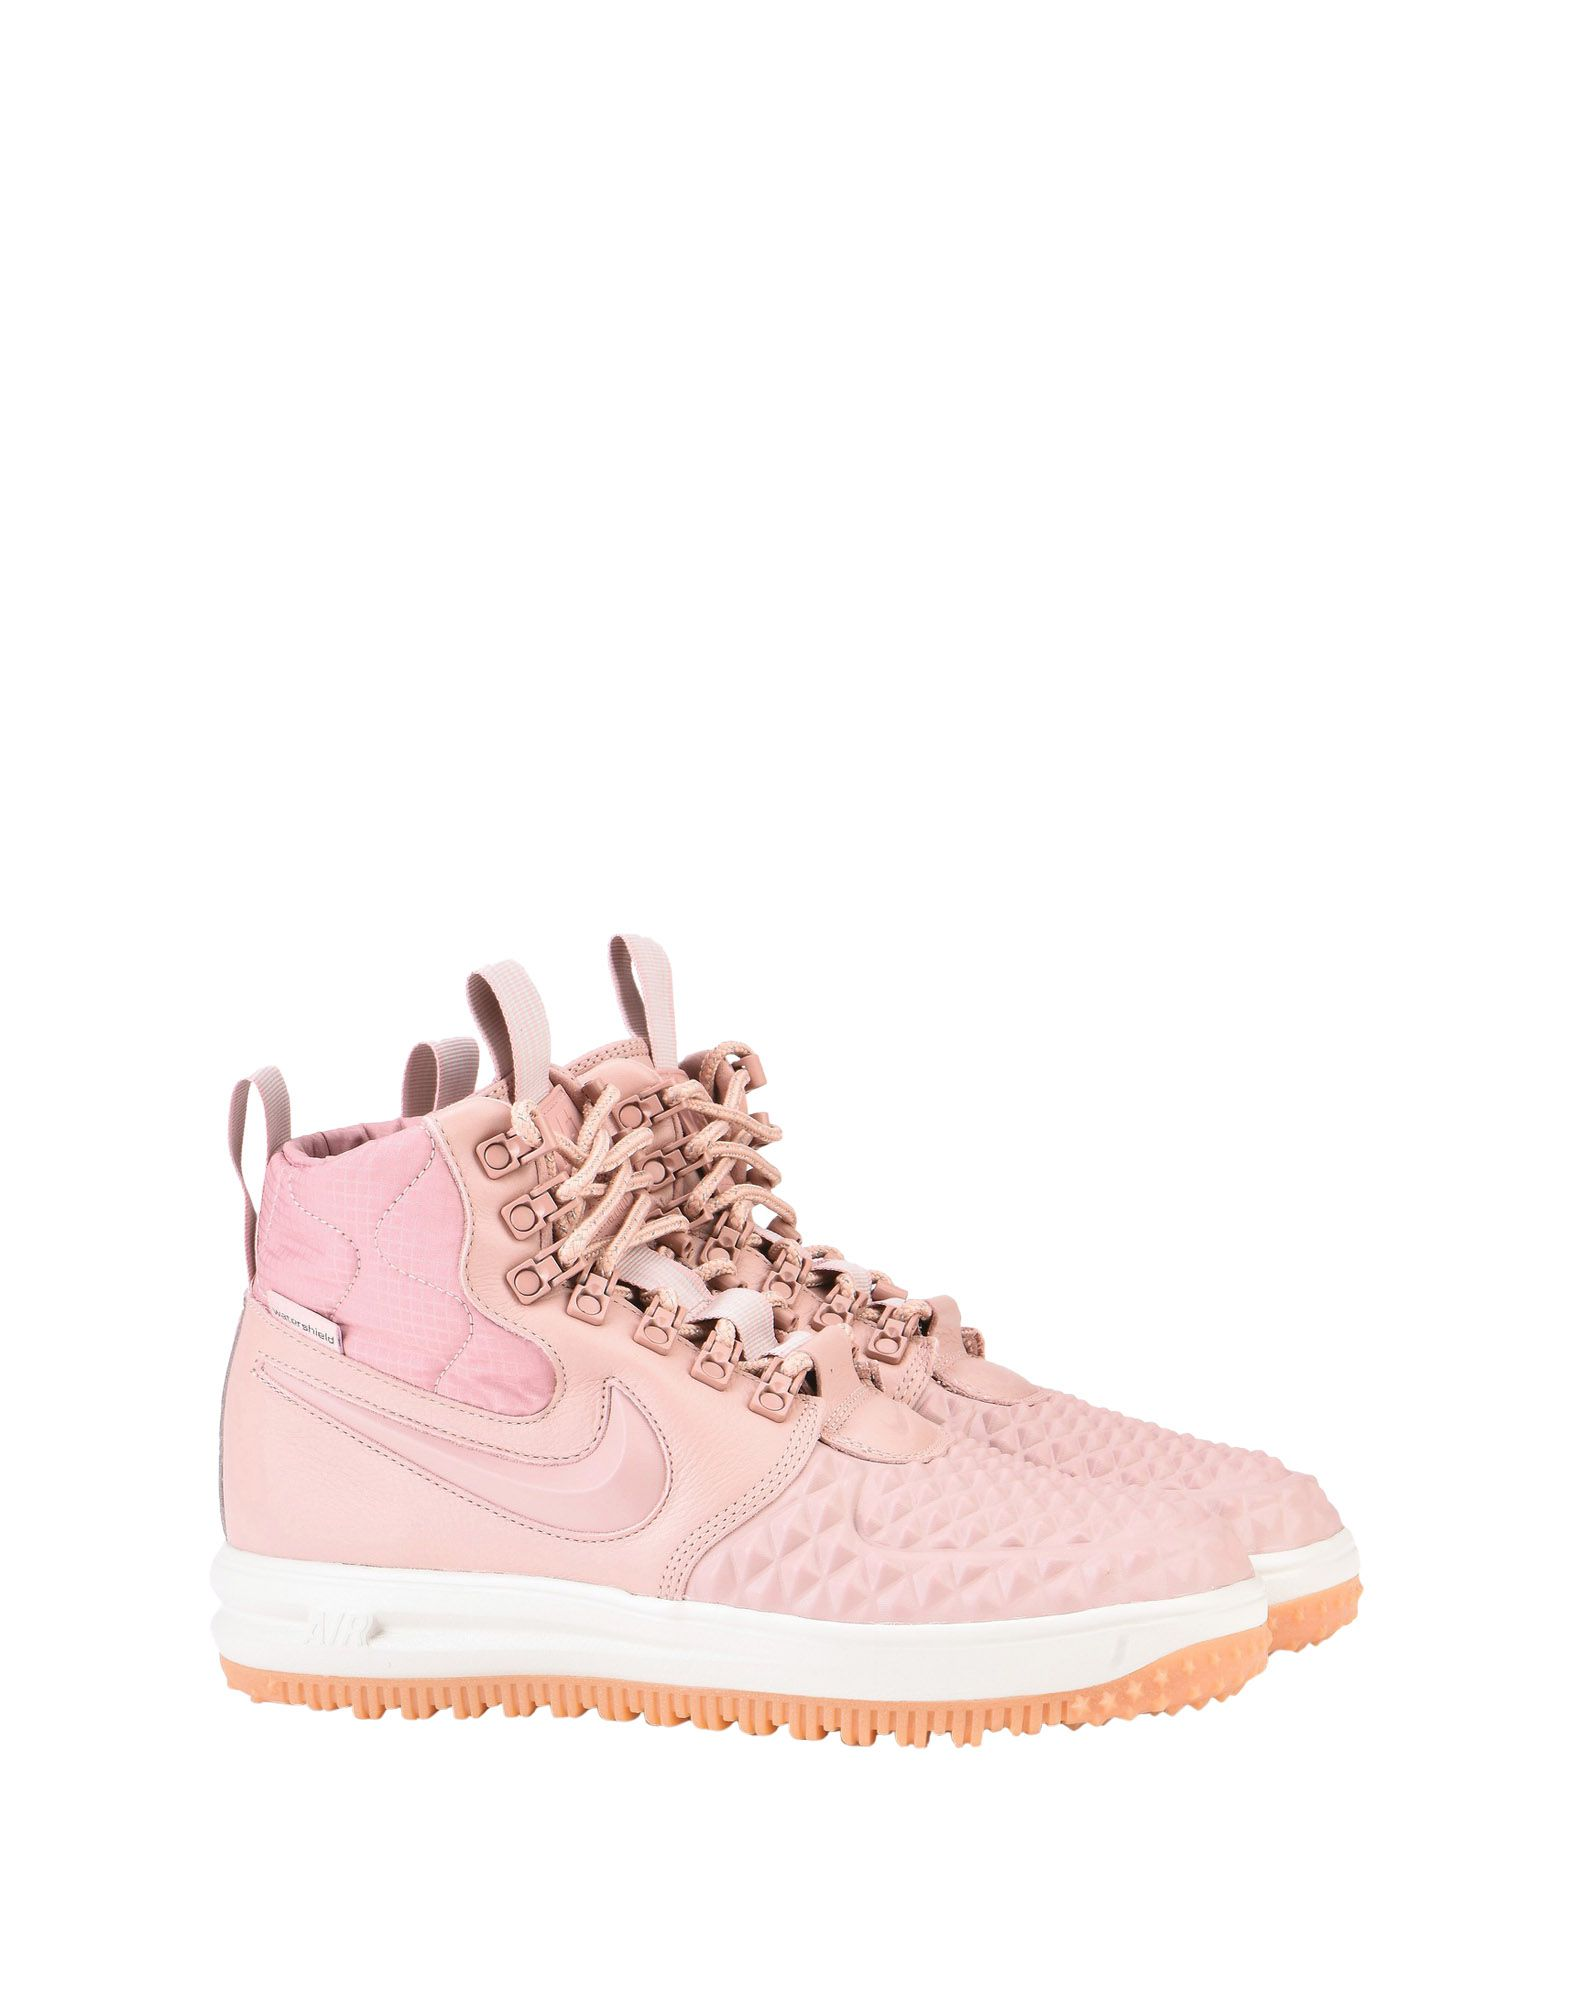 Stilvolle Stilvolle Stilvolle billige Schuhe Nike W Lf1 Duckboot  11404938XO 993401